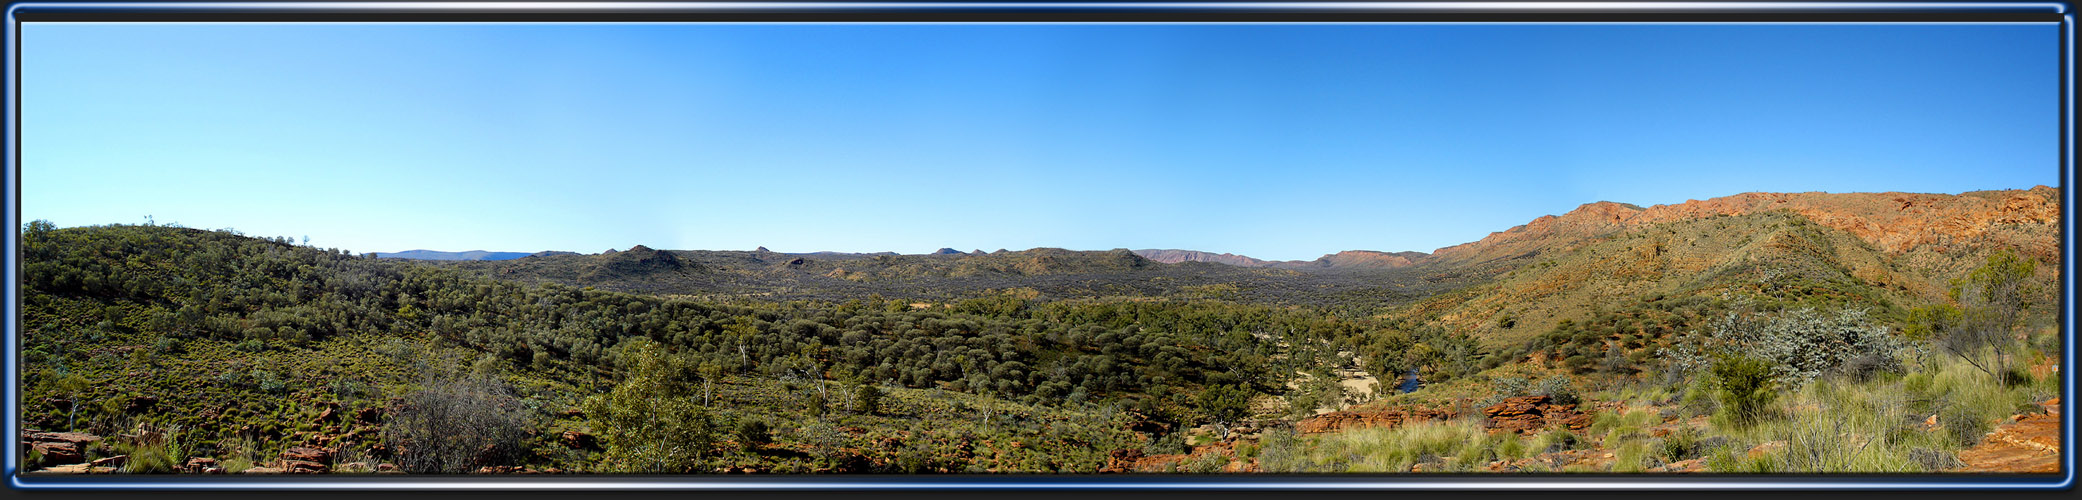 Trephina Gorge, Panorama 2